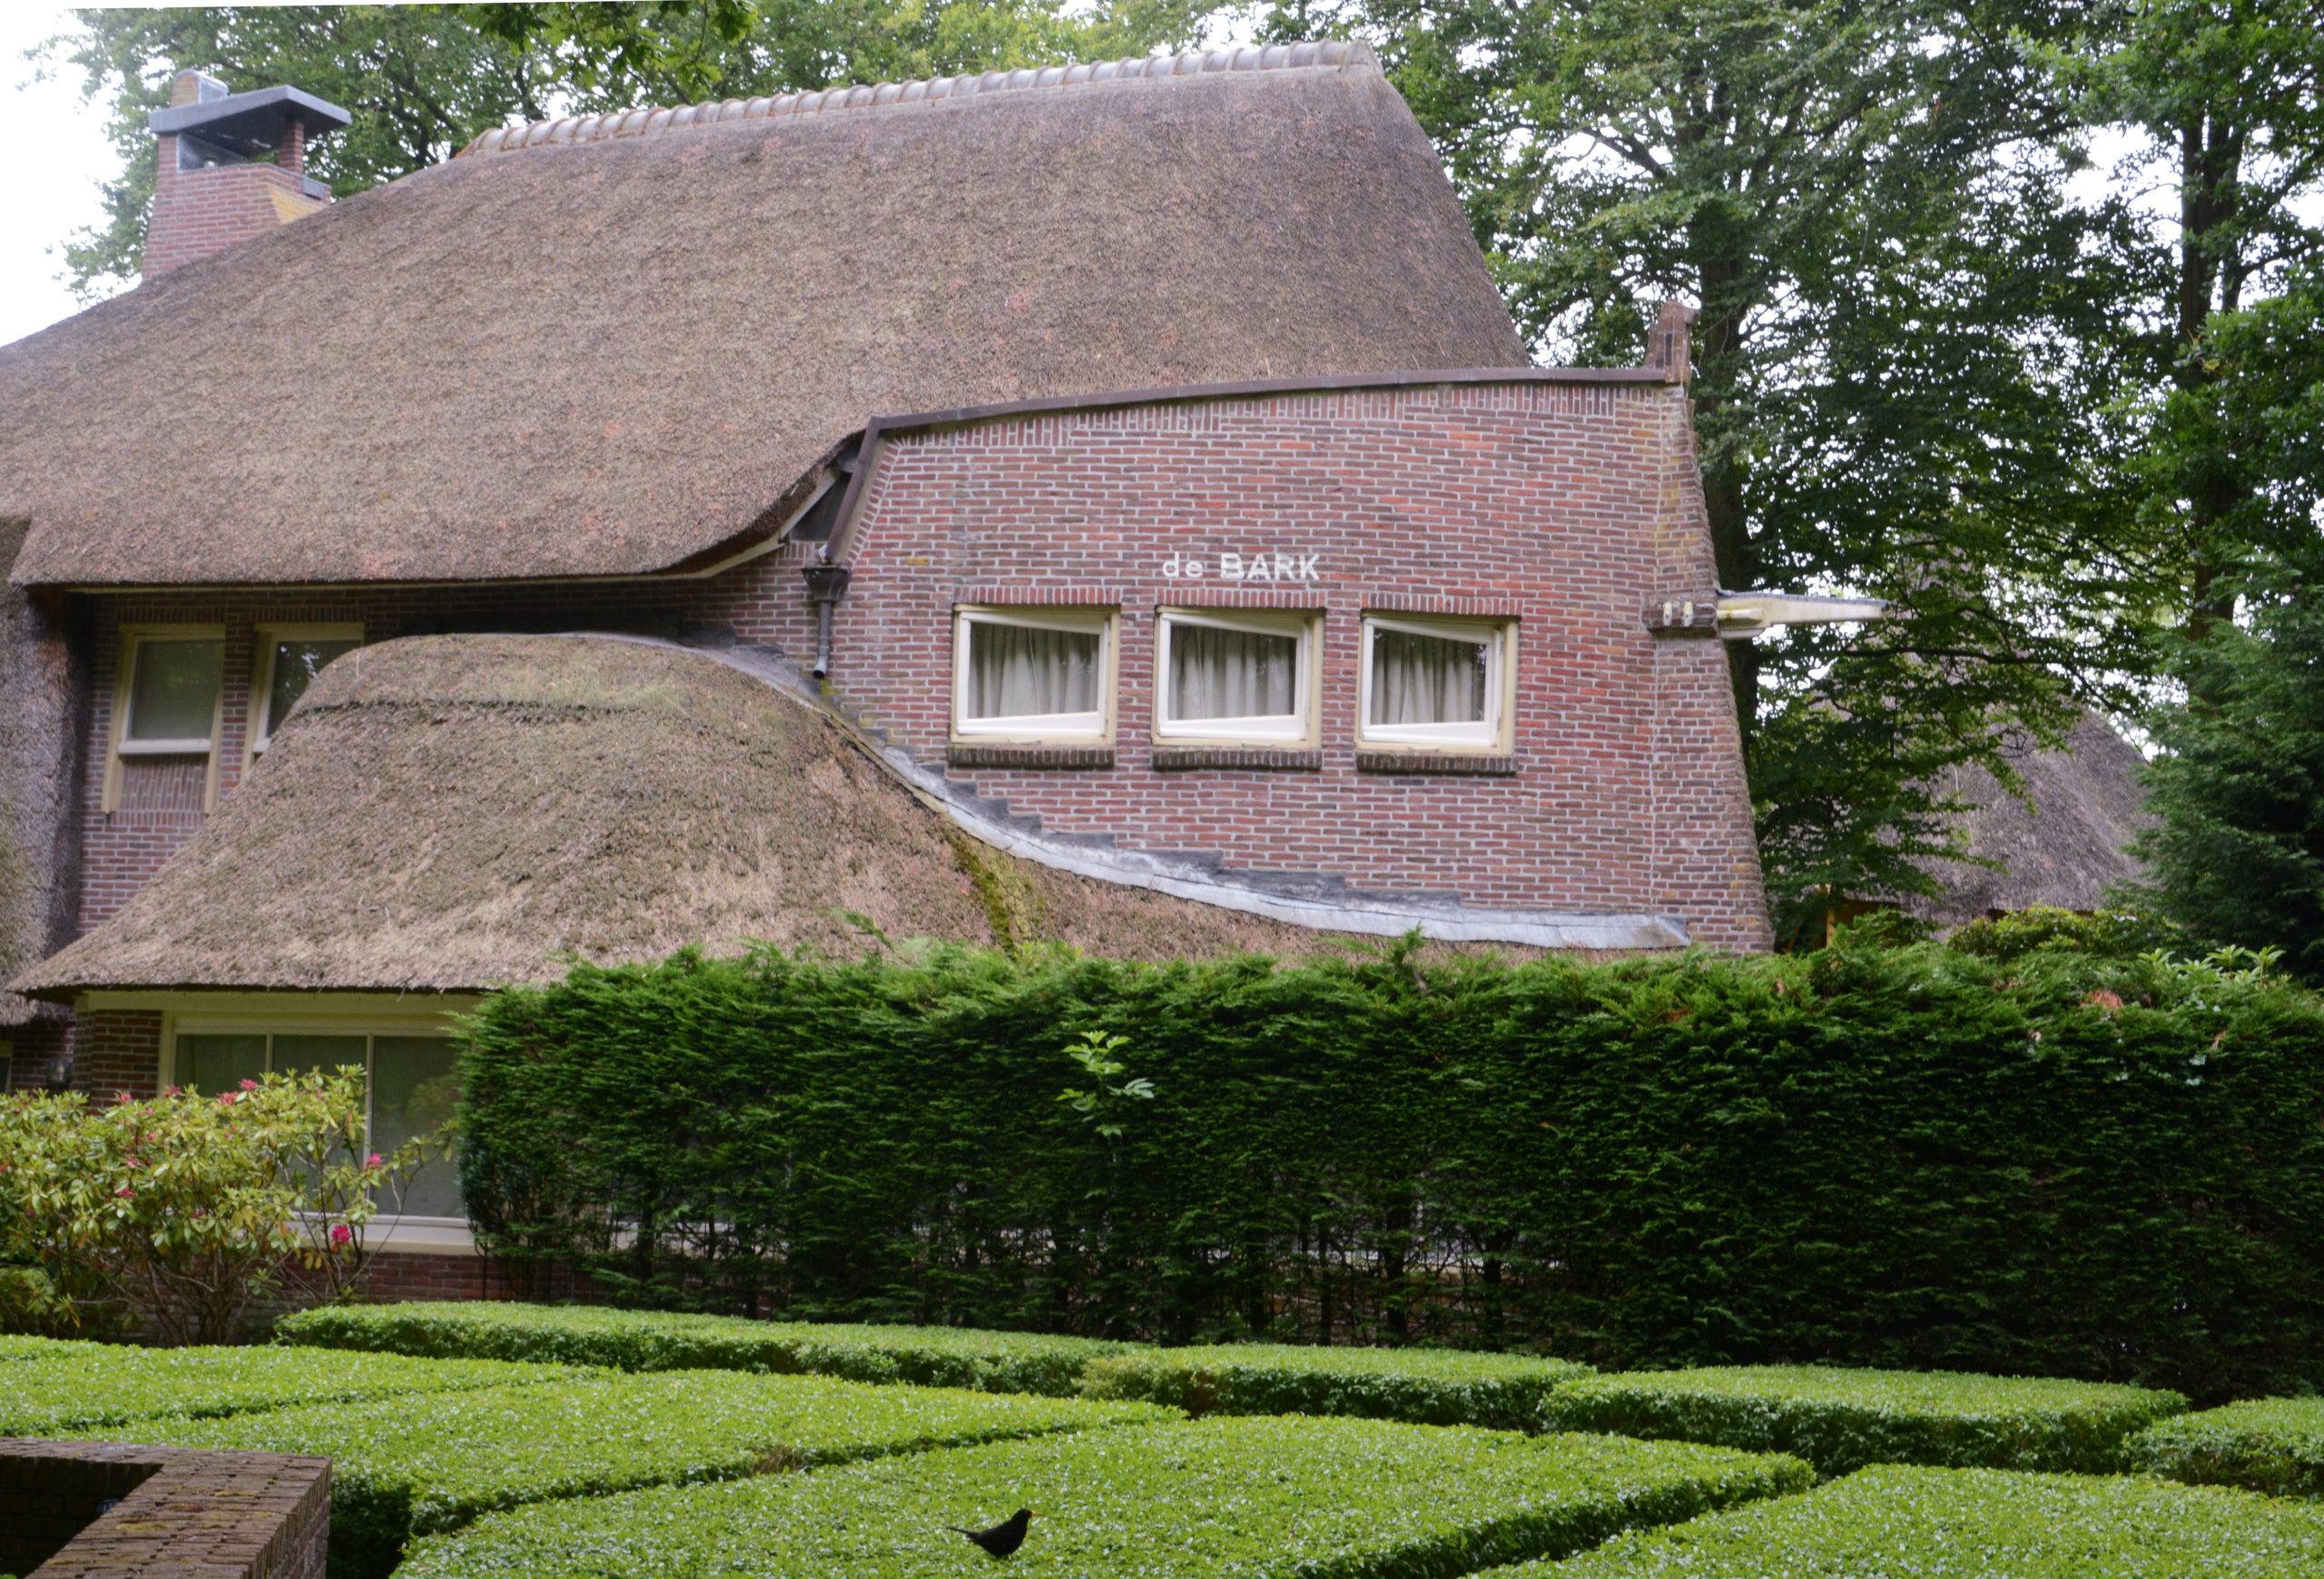 Villa »De Bark« in Bergen im Stil der Amsterdamer Schule